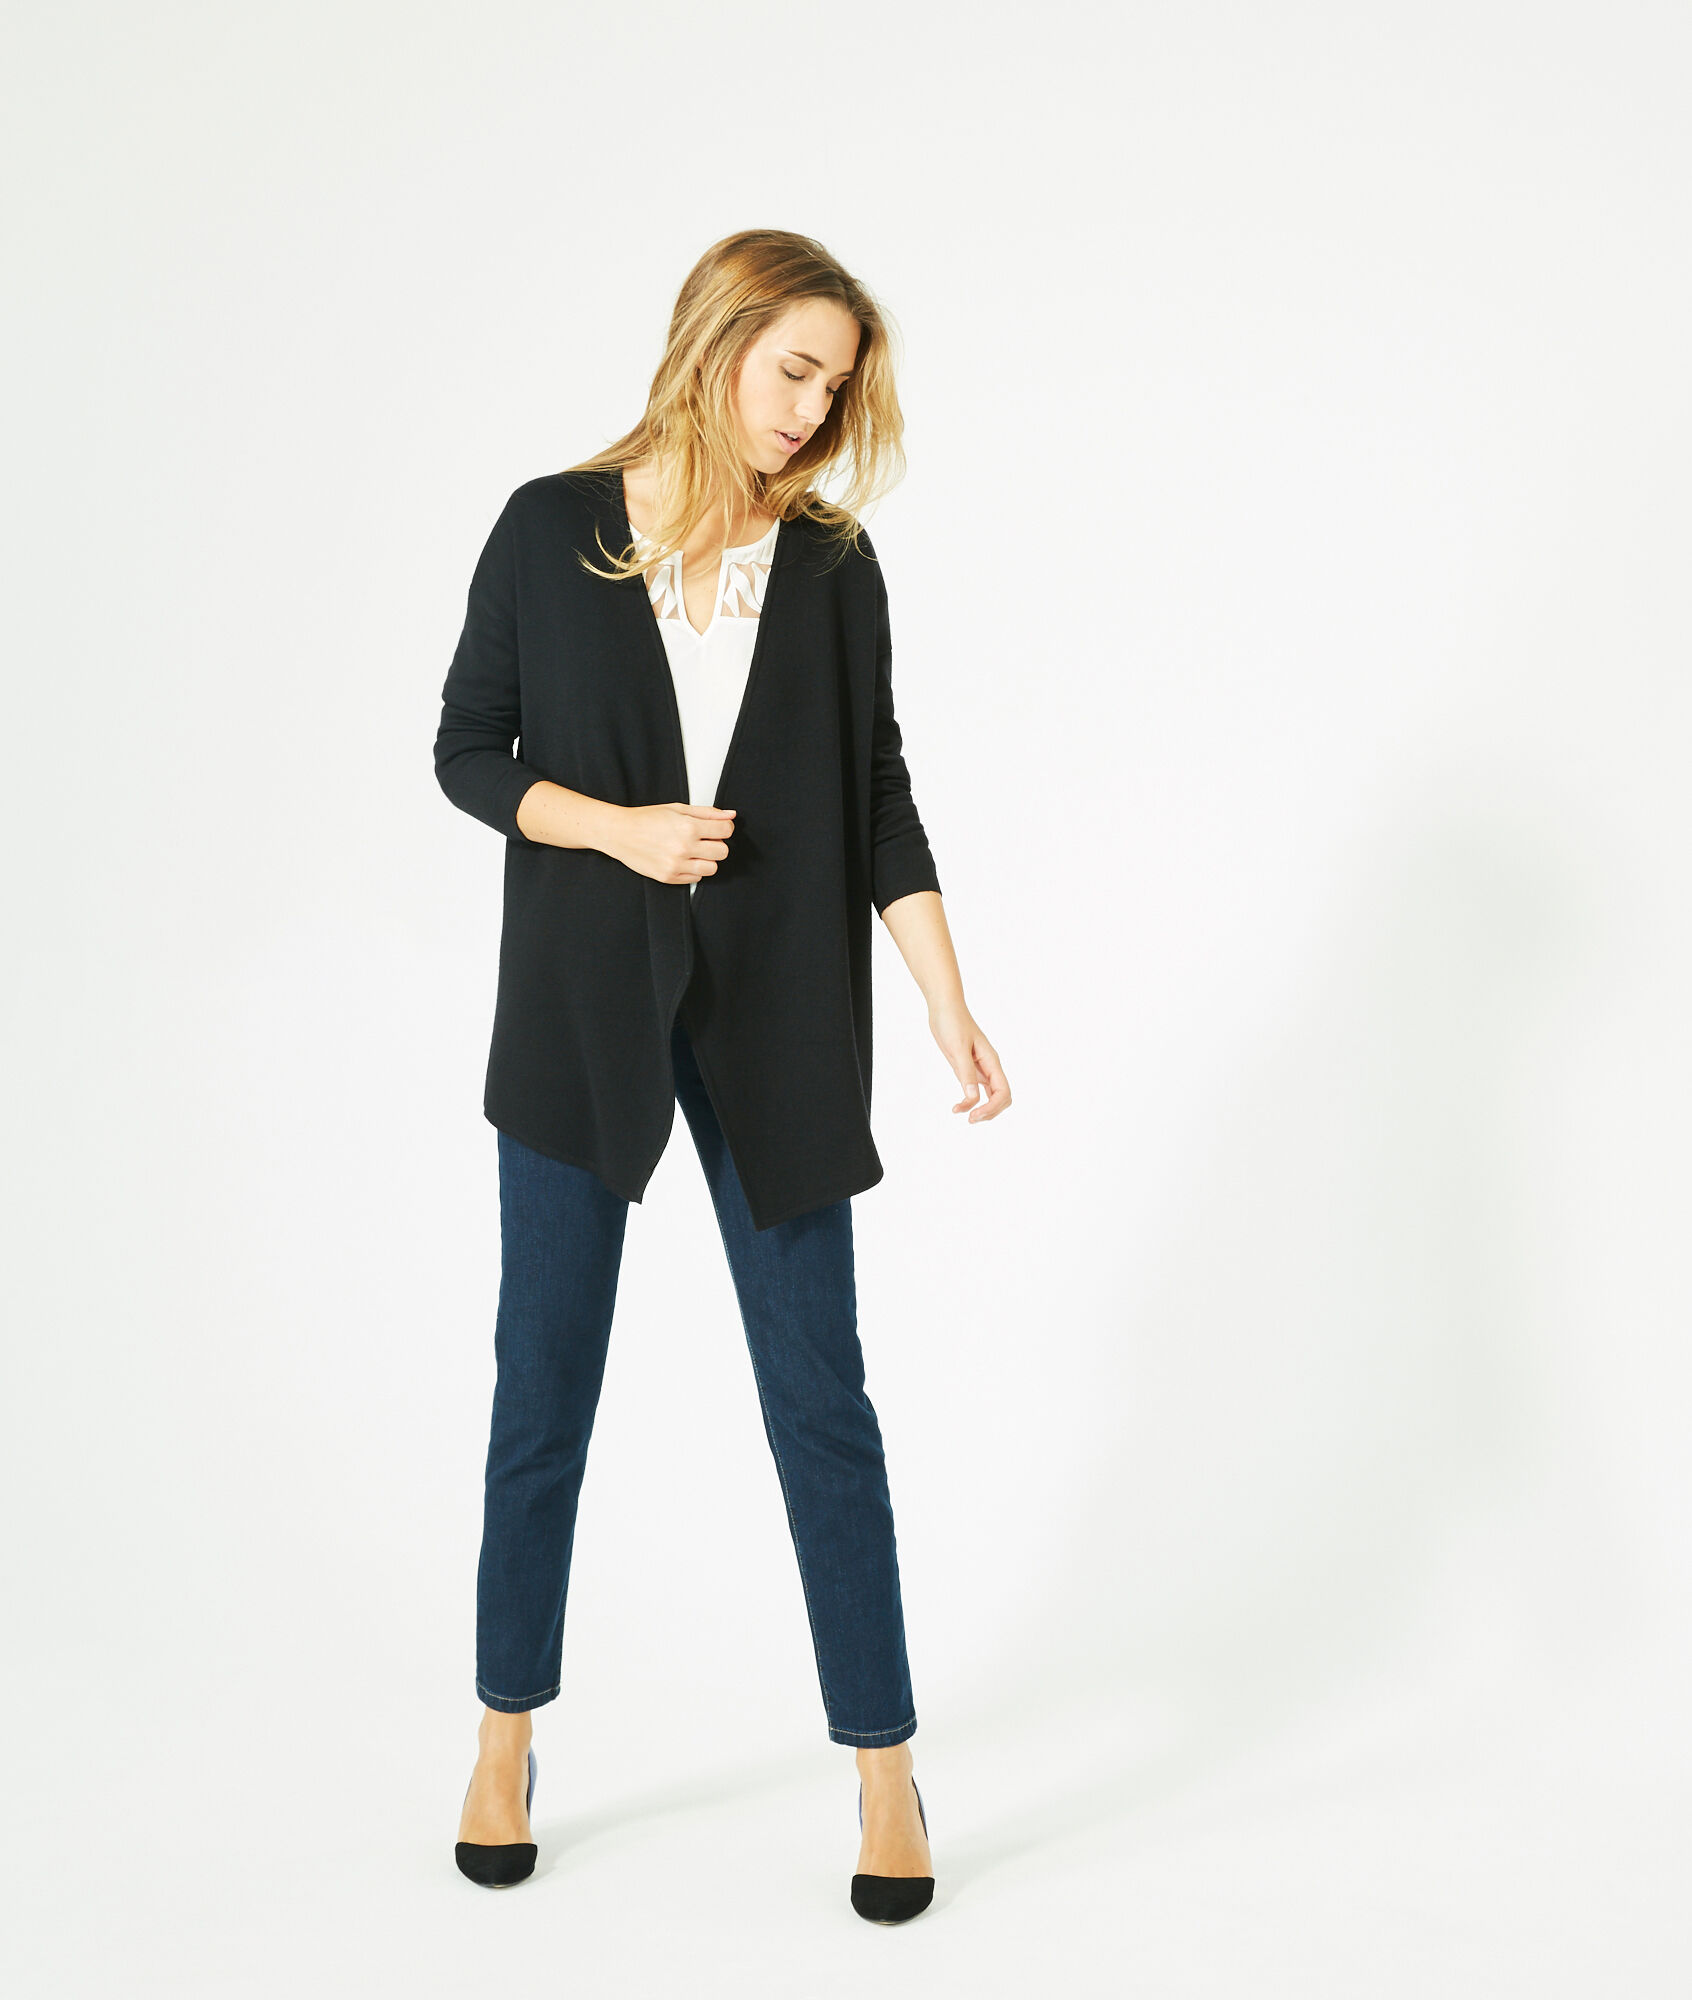 Papyrus long, black, wool-blend cardigan jacket - 123